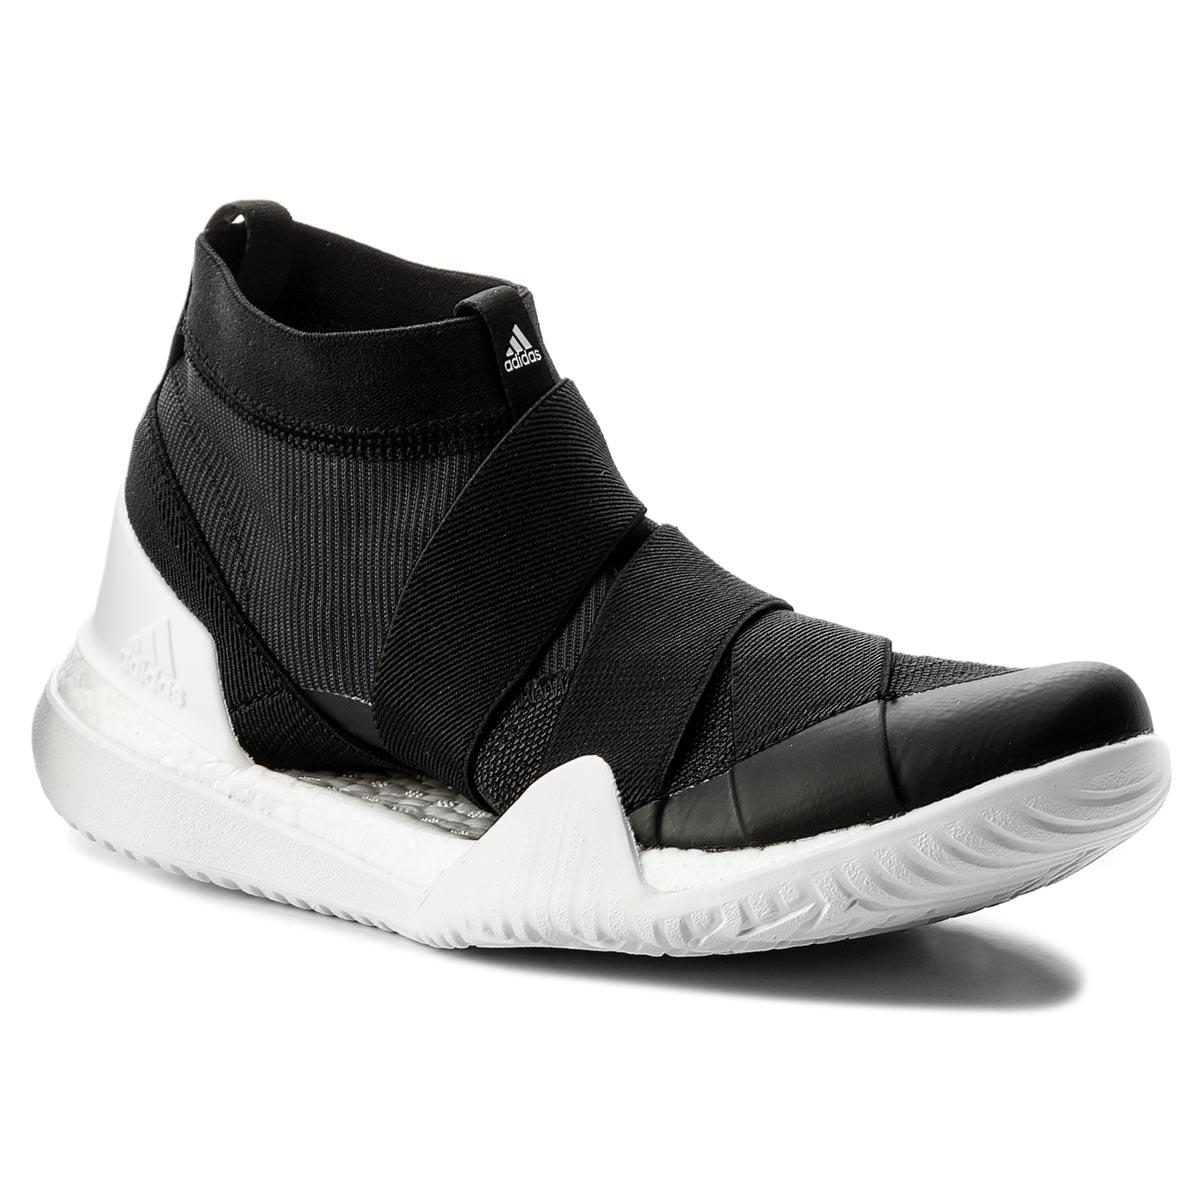 new product 63324 8eb74 Shoes adidas PureBoost X Trainer 3.0 Ll CG3524 Cblack Crywht Carbon